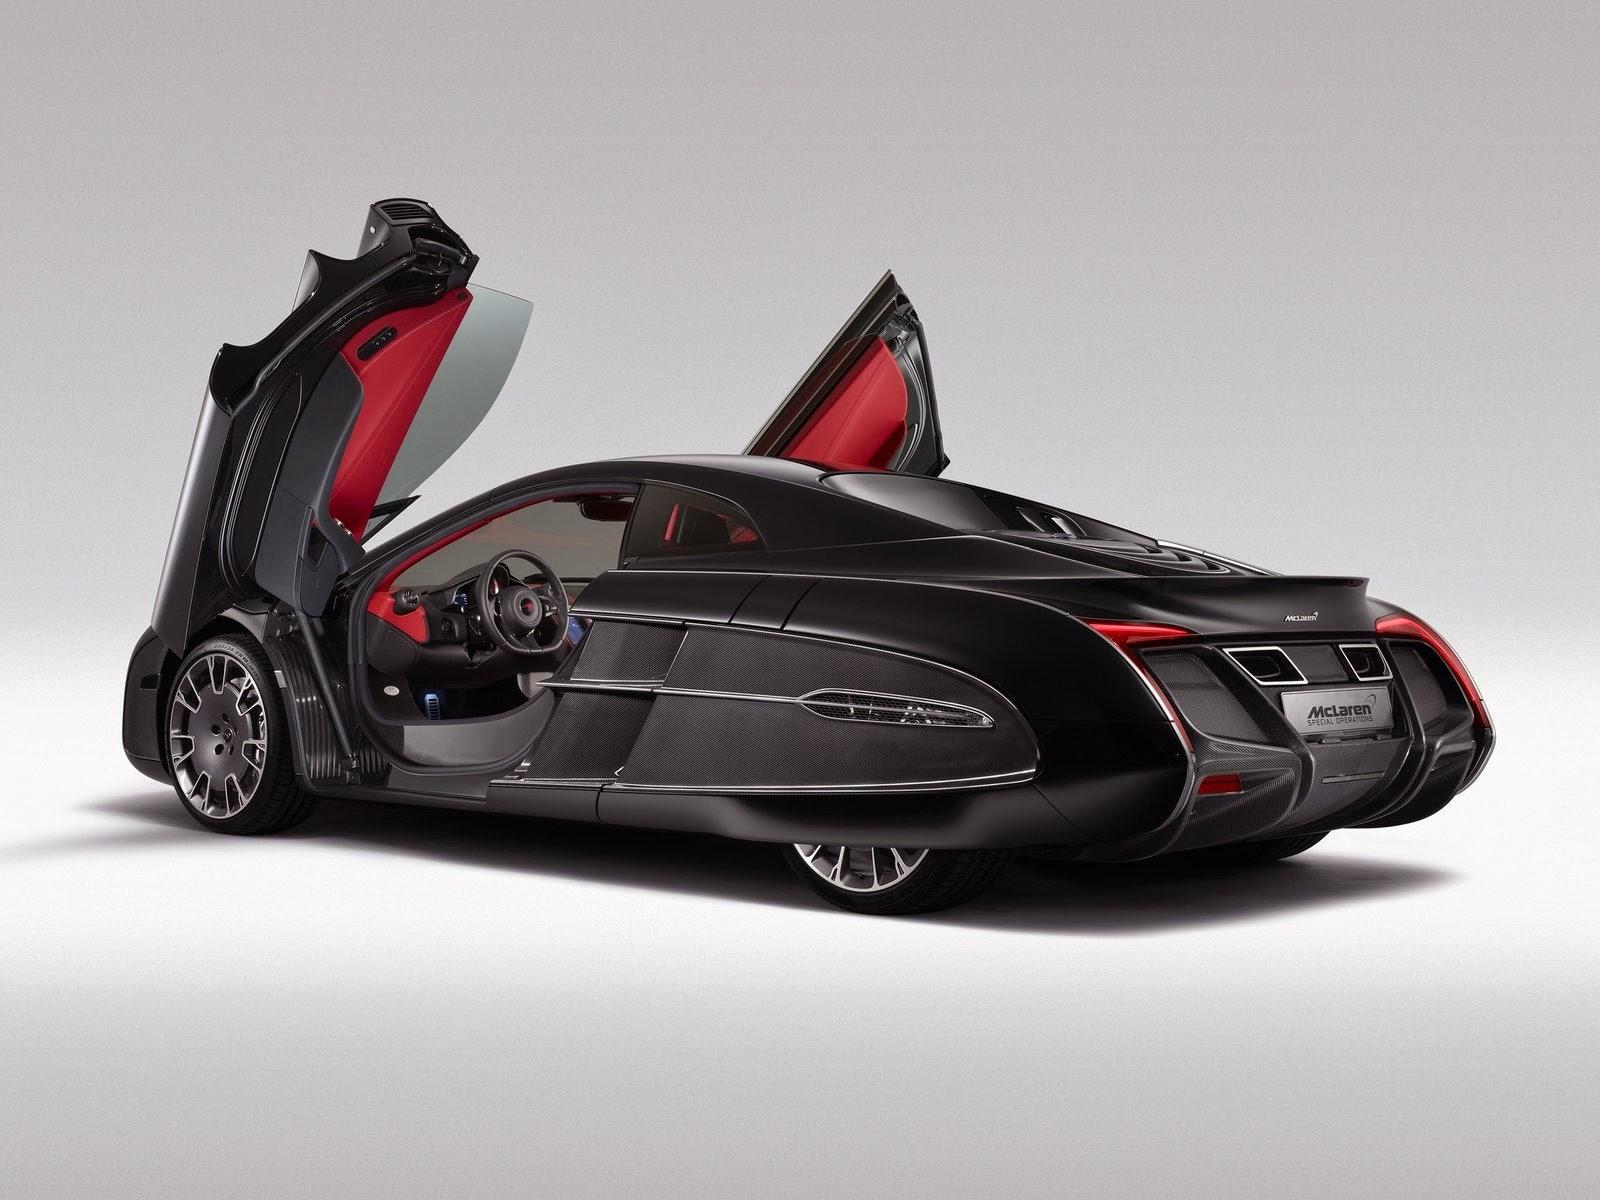 Mclaren Cars Wallpaper Hd: All Hot Informations: Download McLaren X1 Cars HD